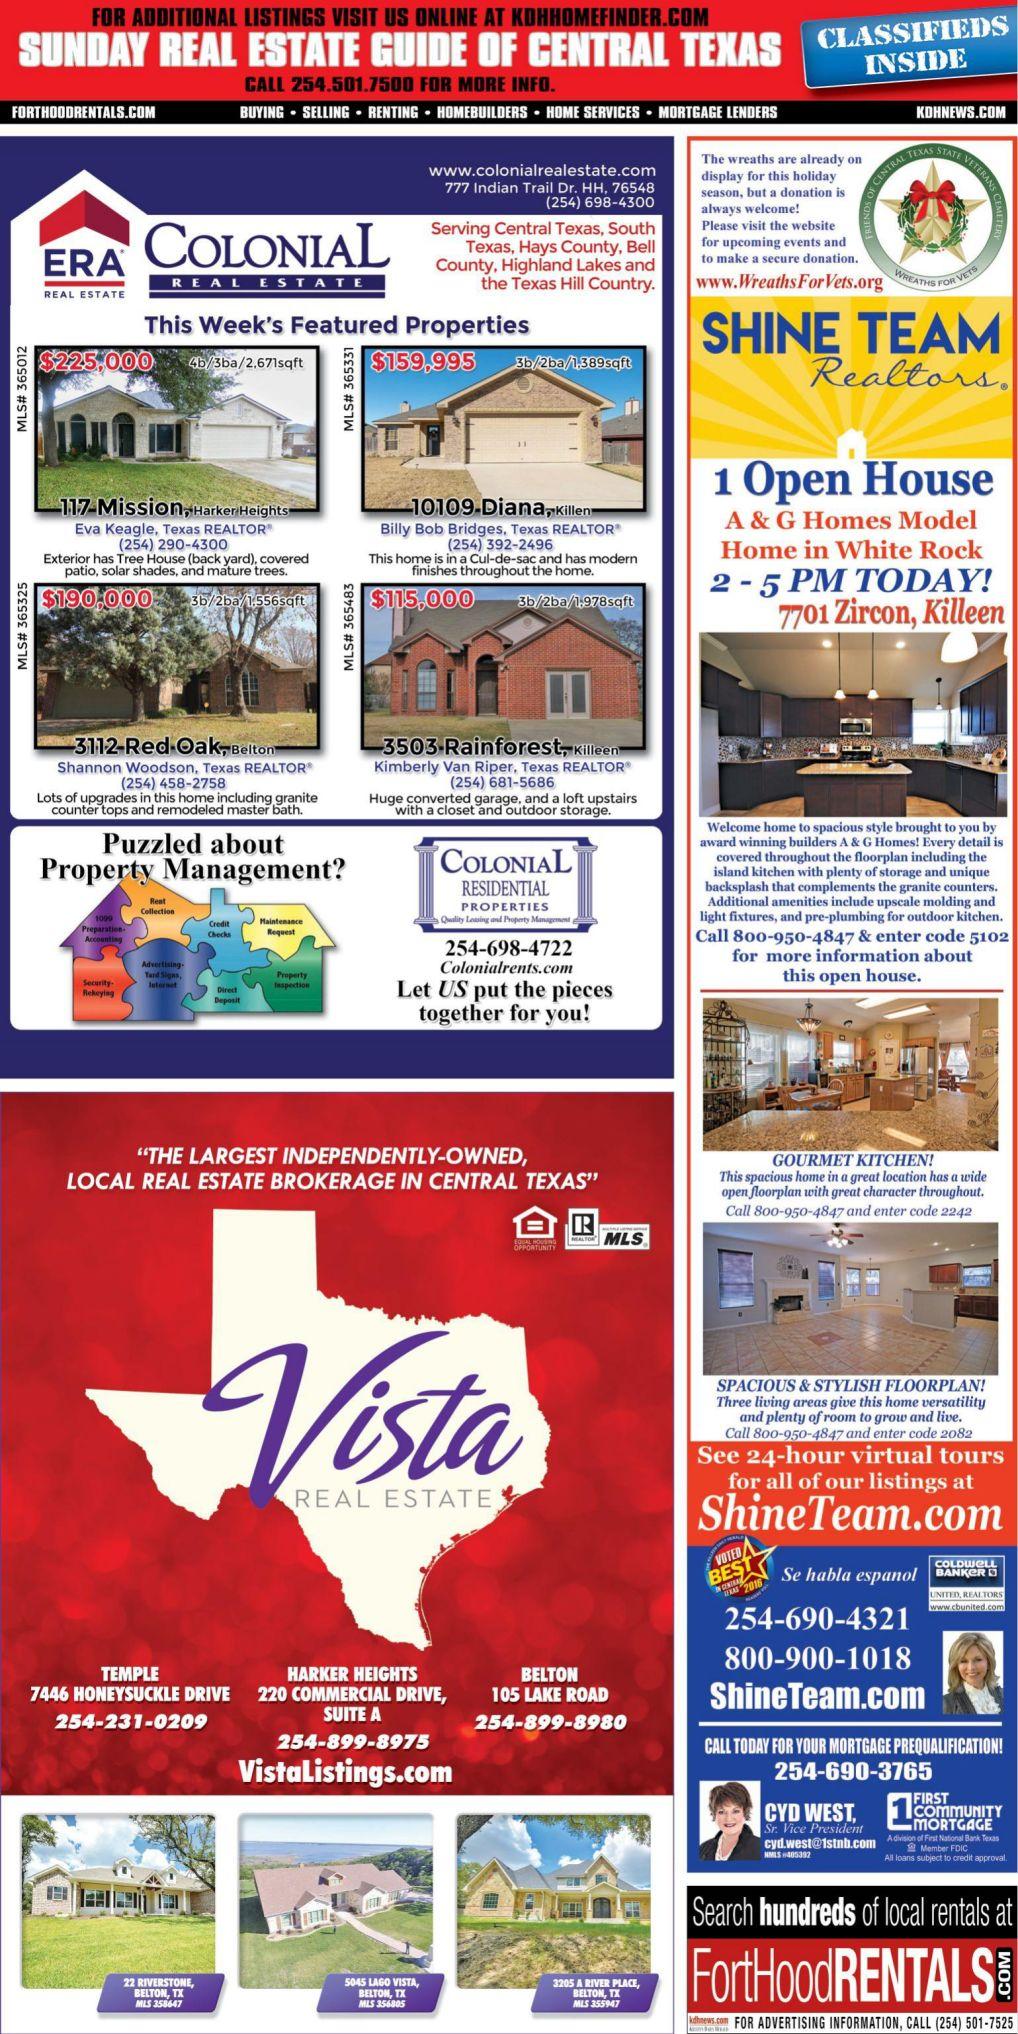 Sunday Real Estate Guide Dec. 16th